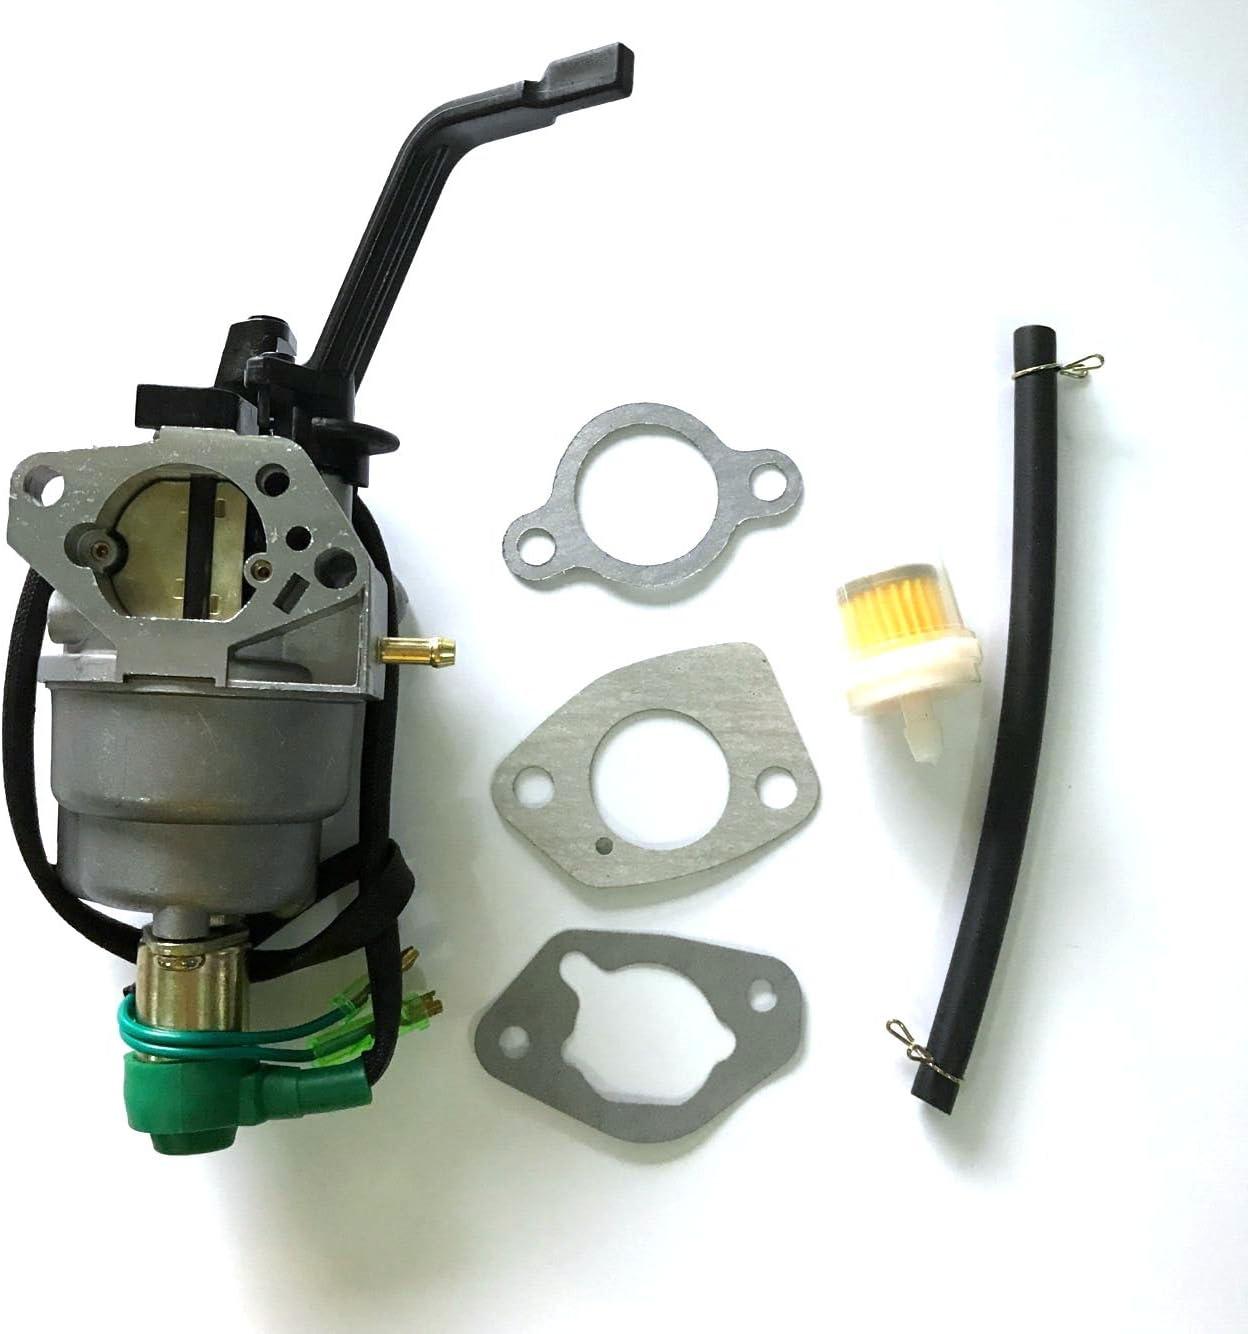 Amazon.com : HQ parts Manual Carburetor & Fuel Filter for GENERAC GP6500  GP6500E GP7500E GP5500 8125W Generator : Garden & OutdoorAmazon.com